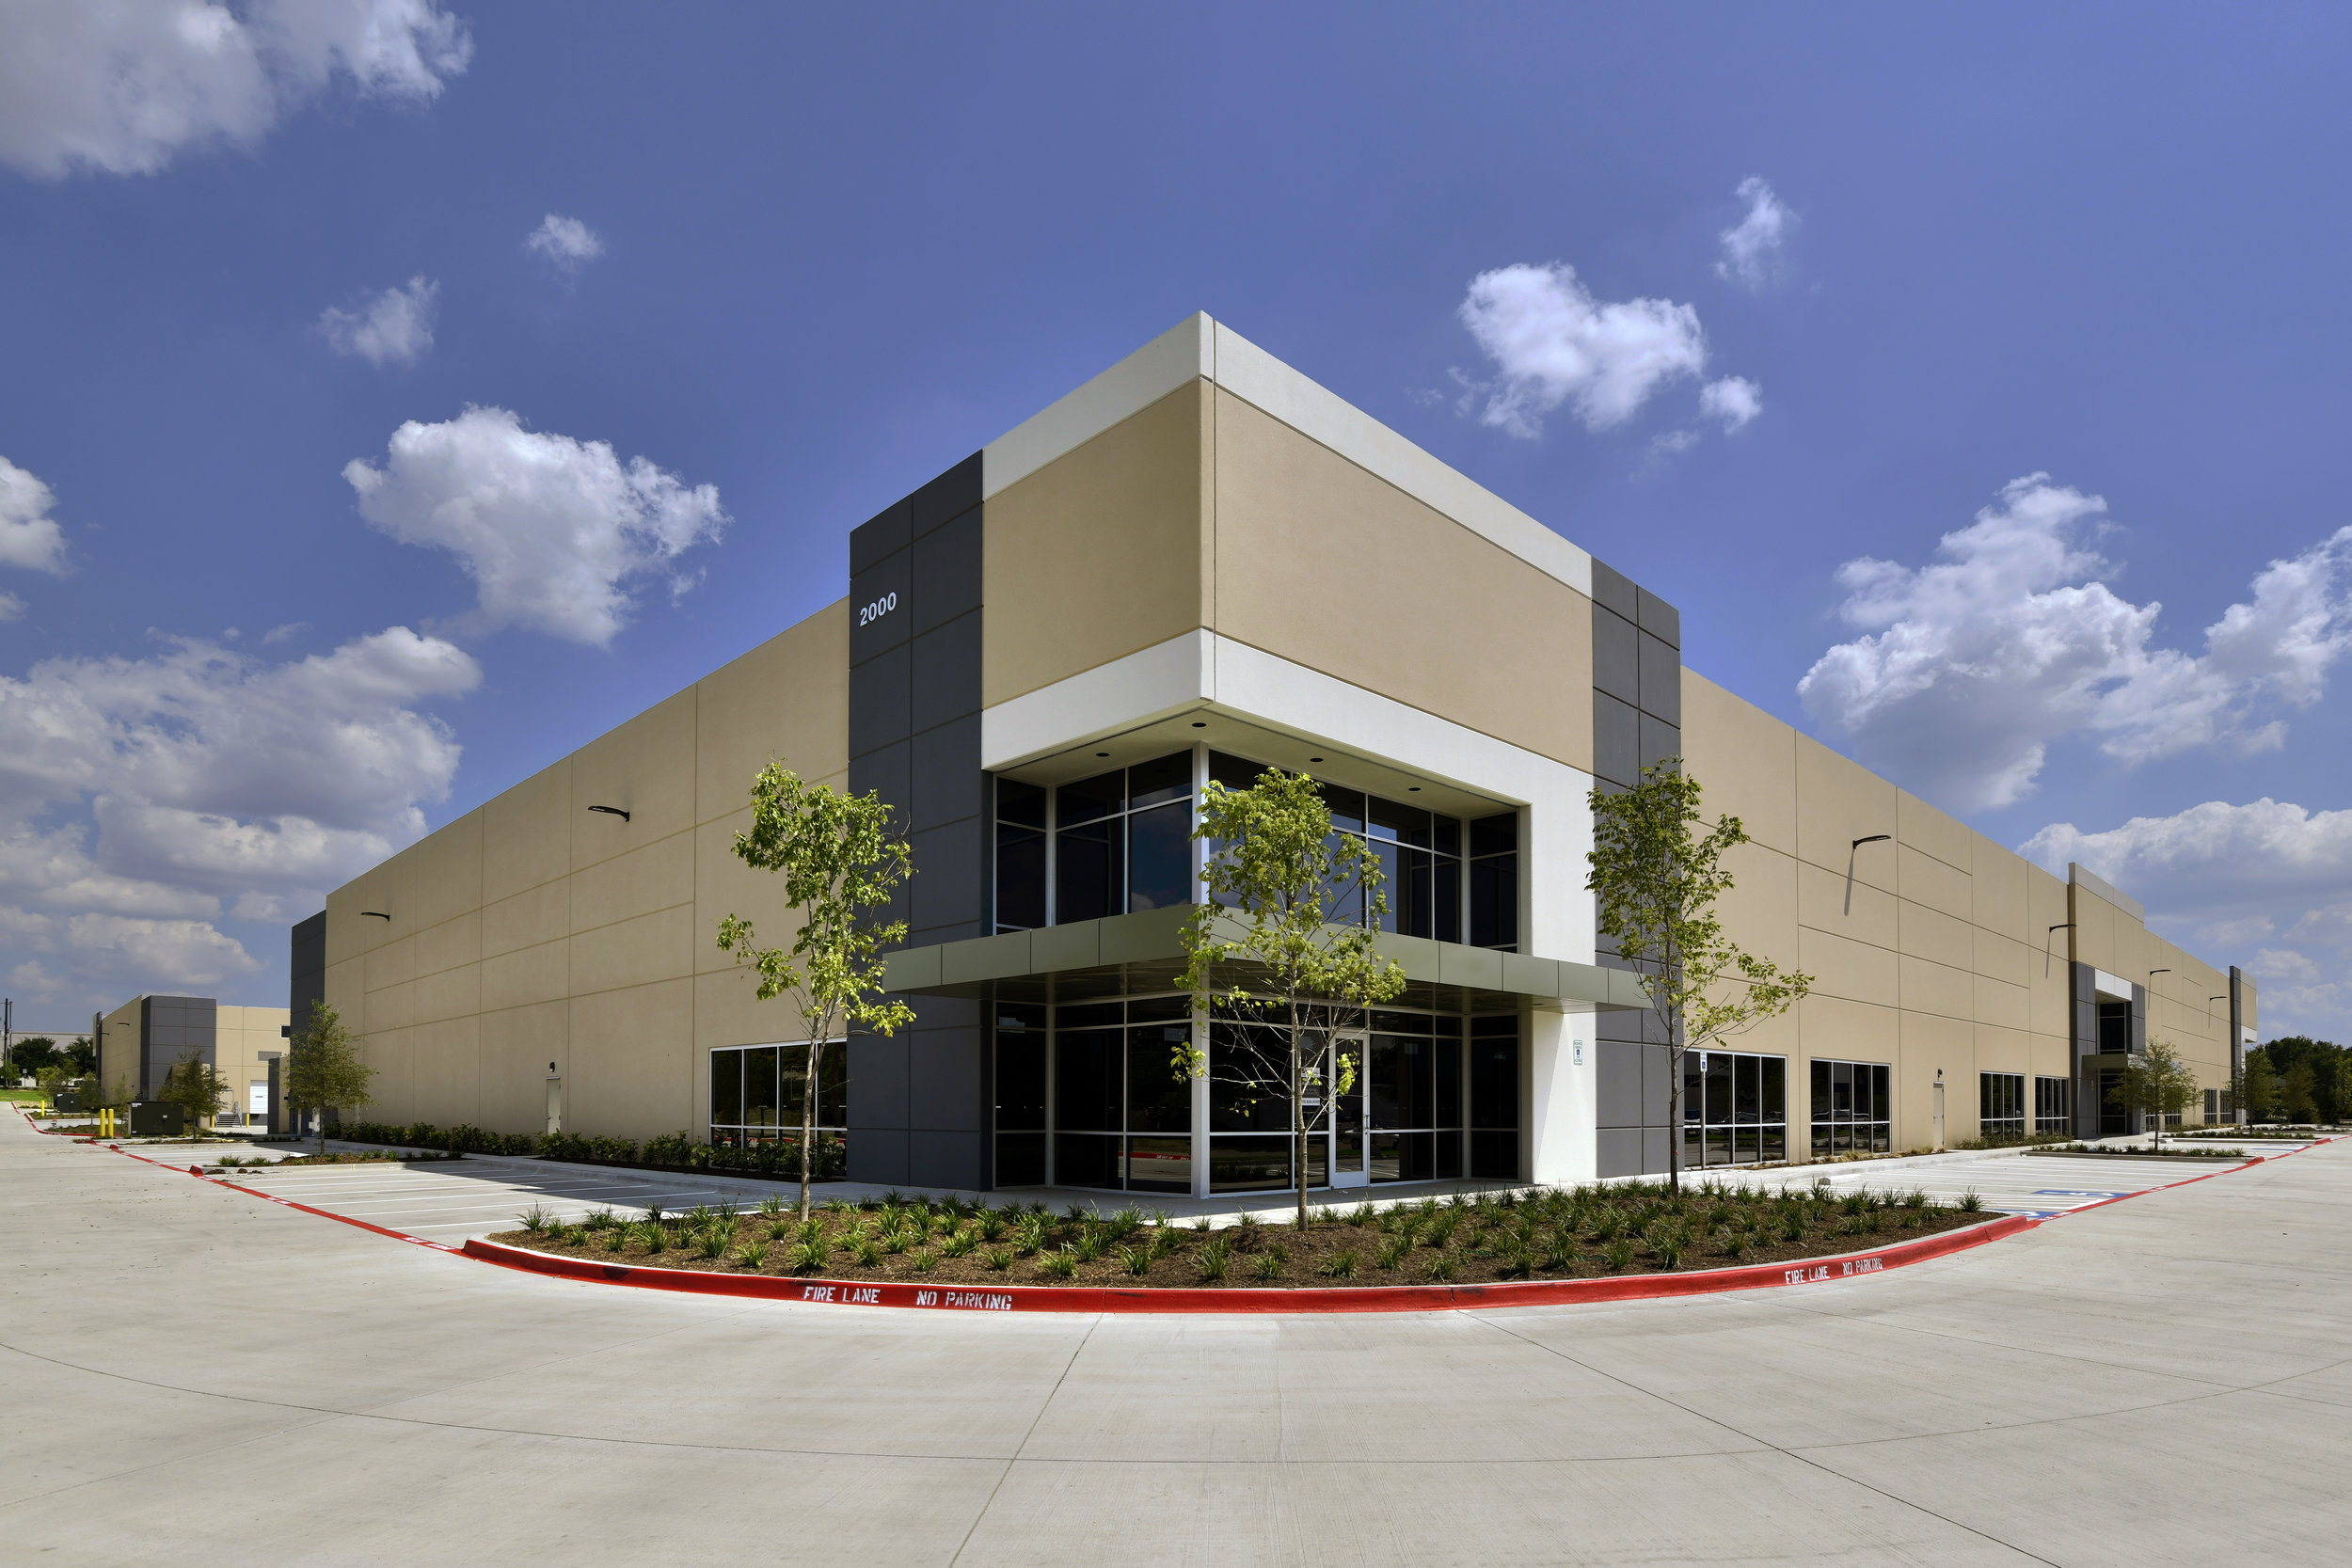 Arbrook Industrial, Arlington, TX